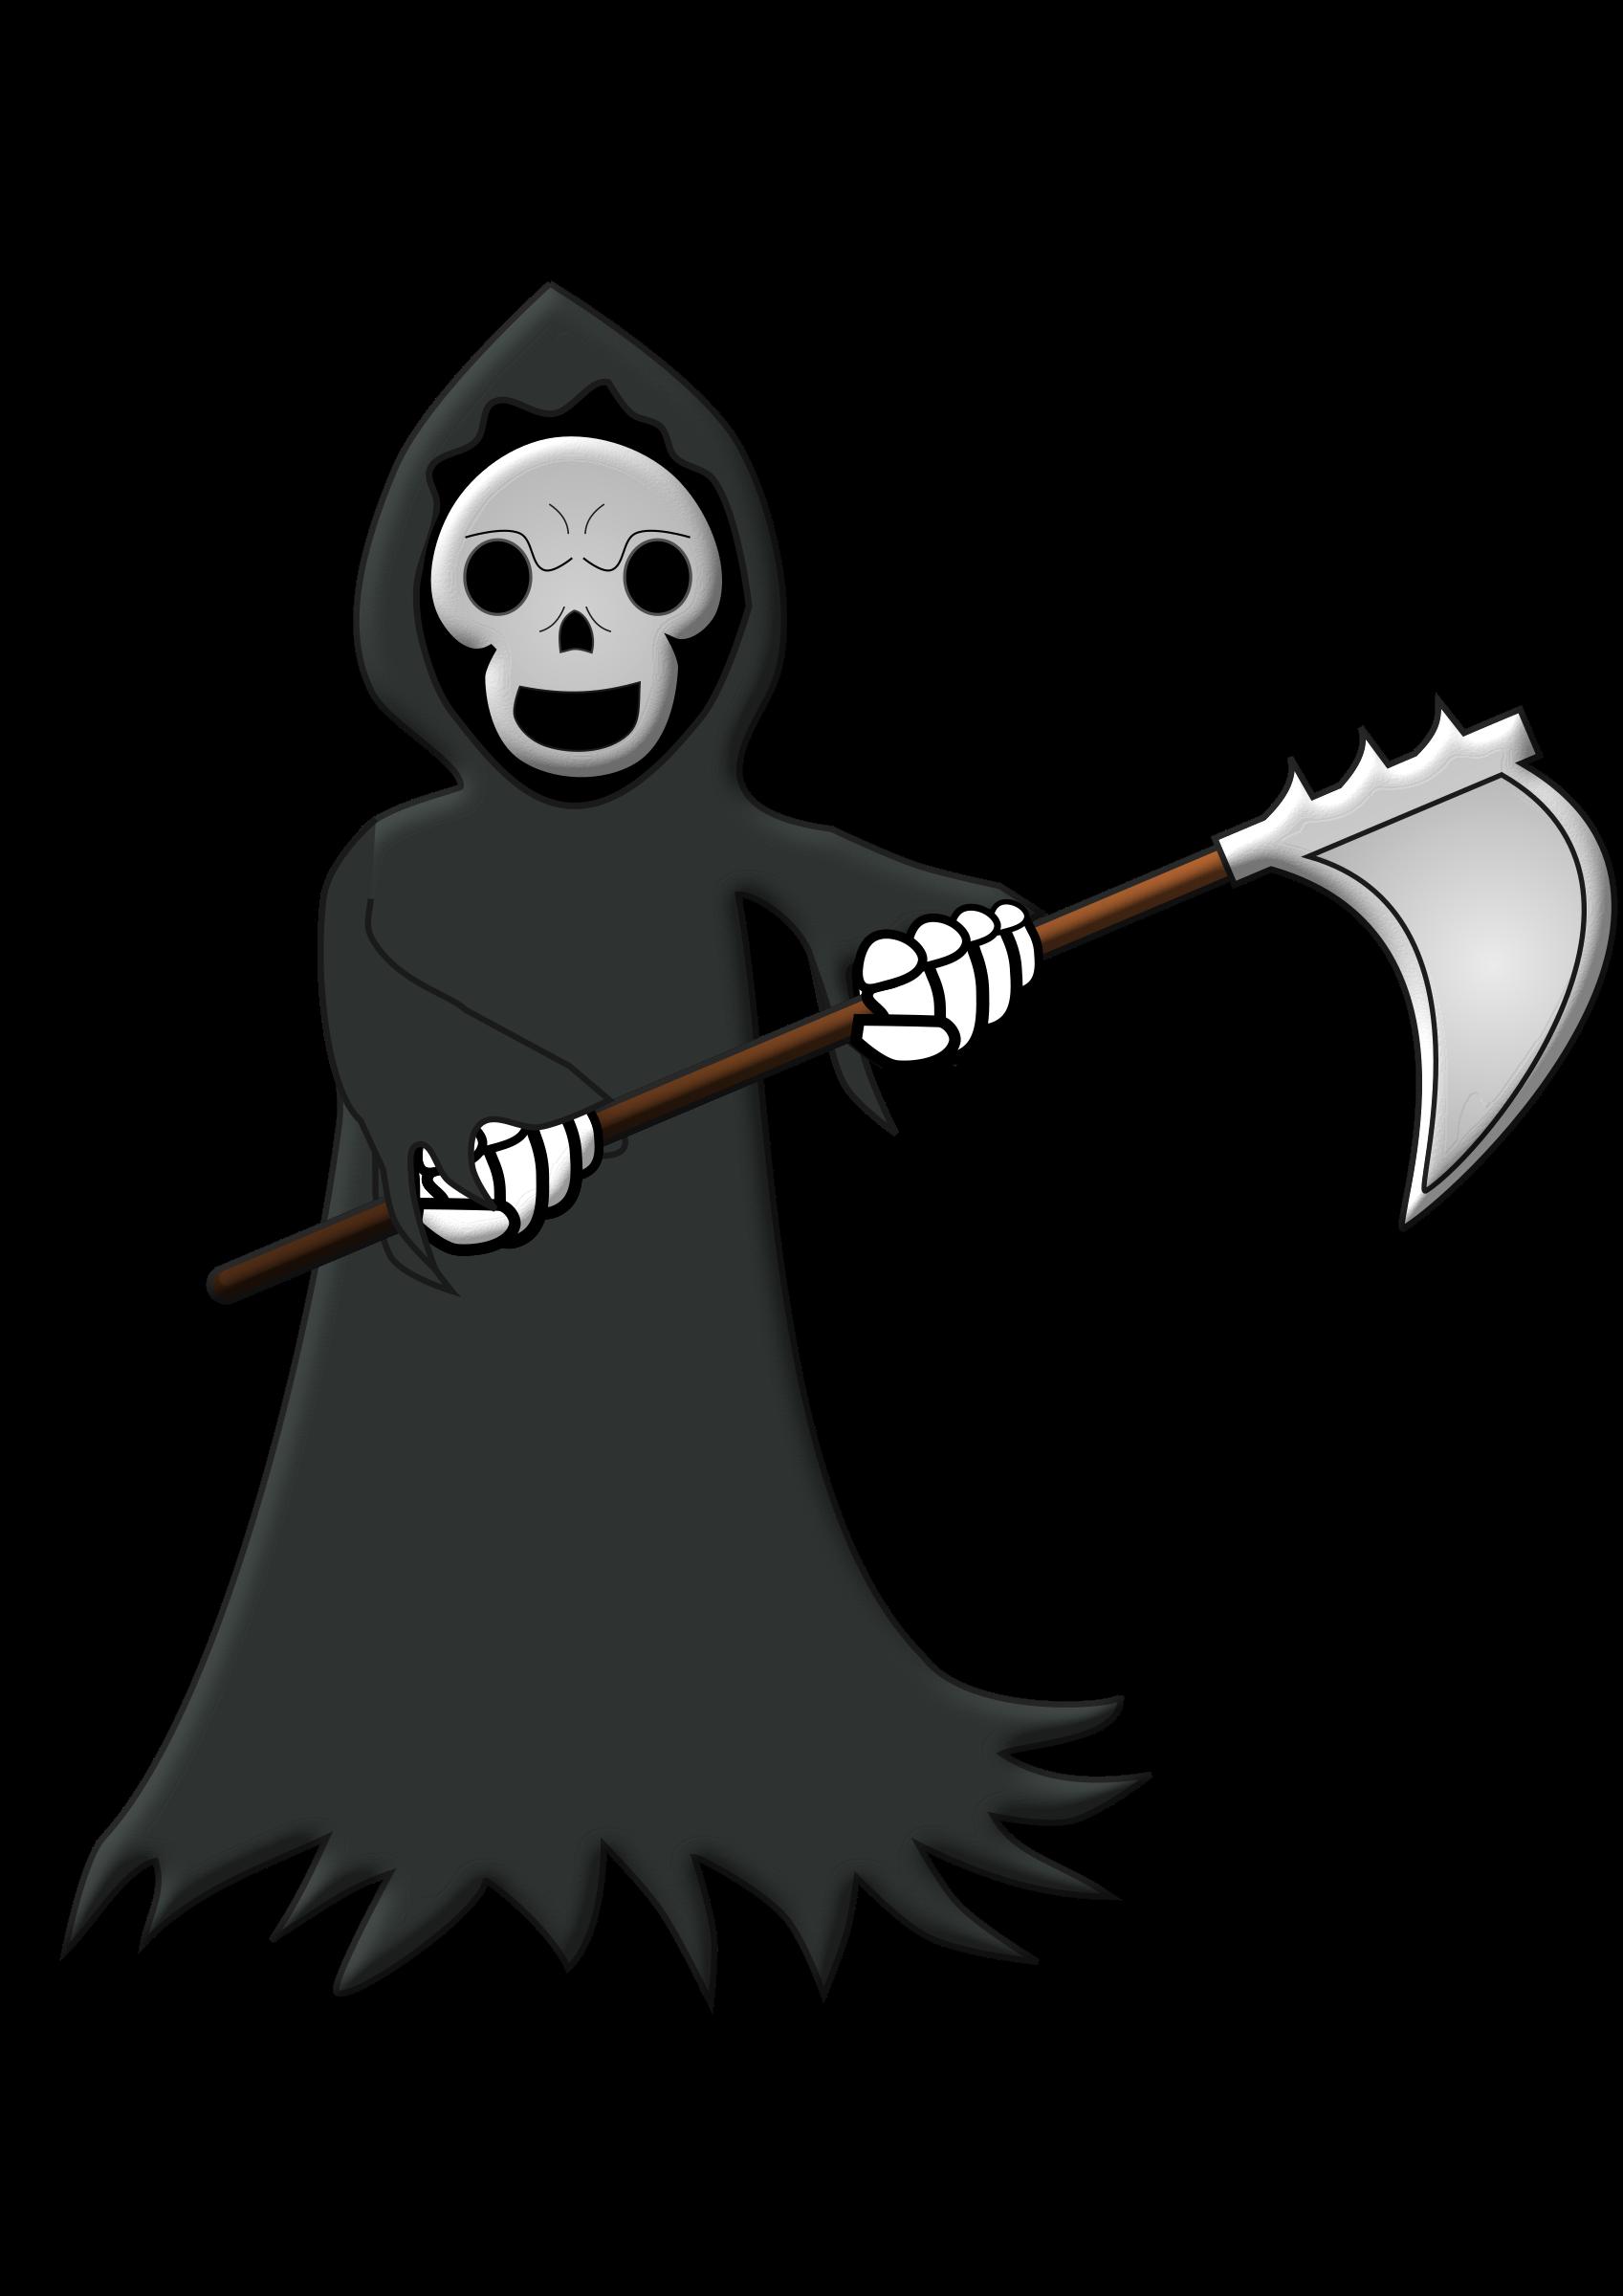 Grim reaper clipart killer, Grim reaper killer Transparent ...